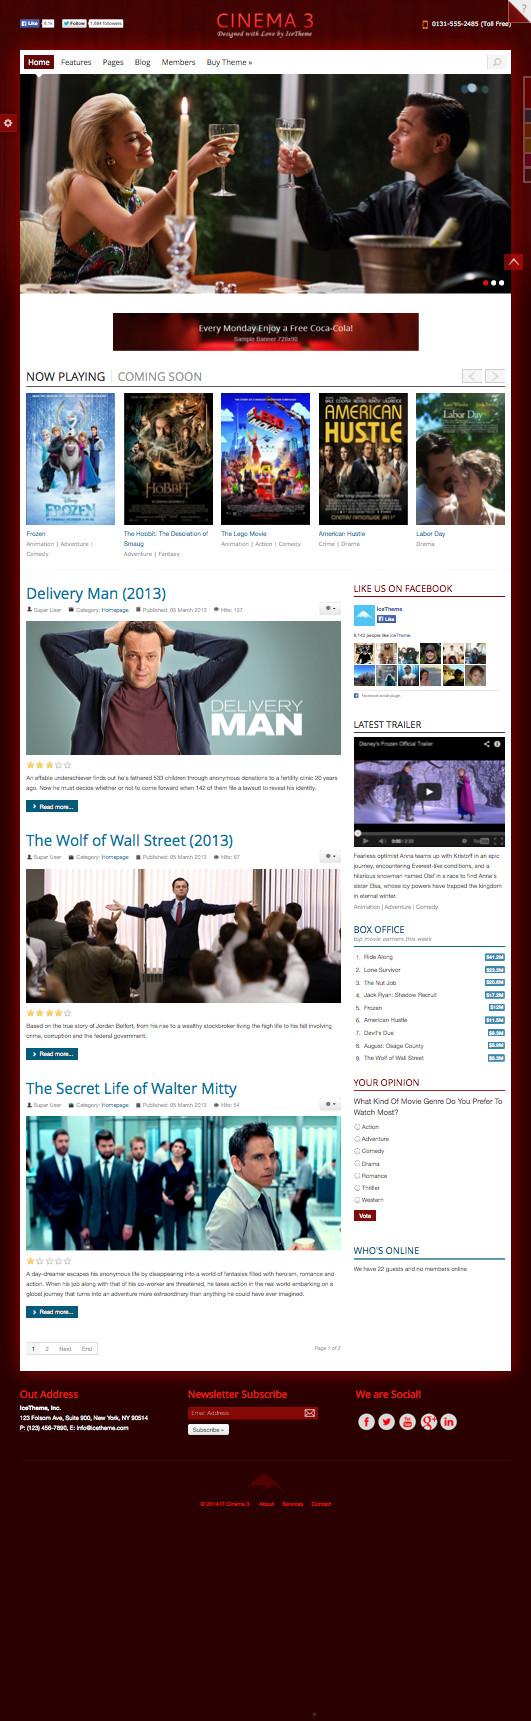 IT Cinema 3 Joomla Movie Release Template